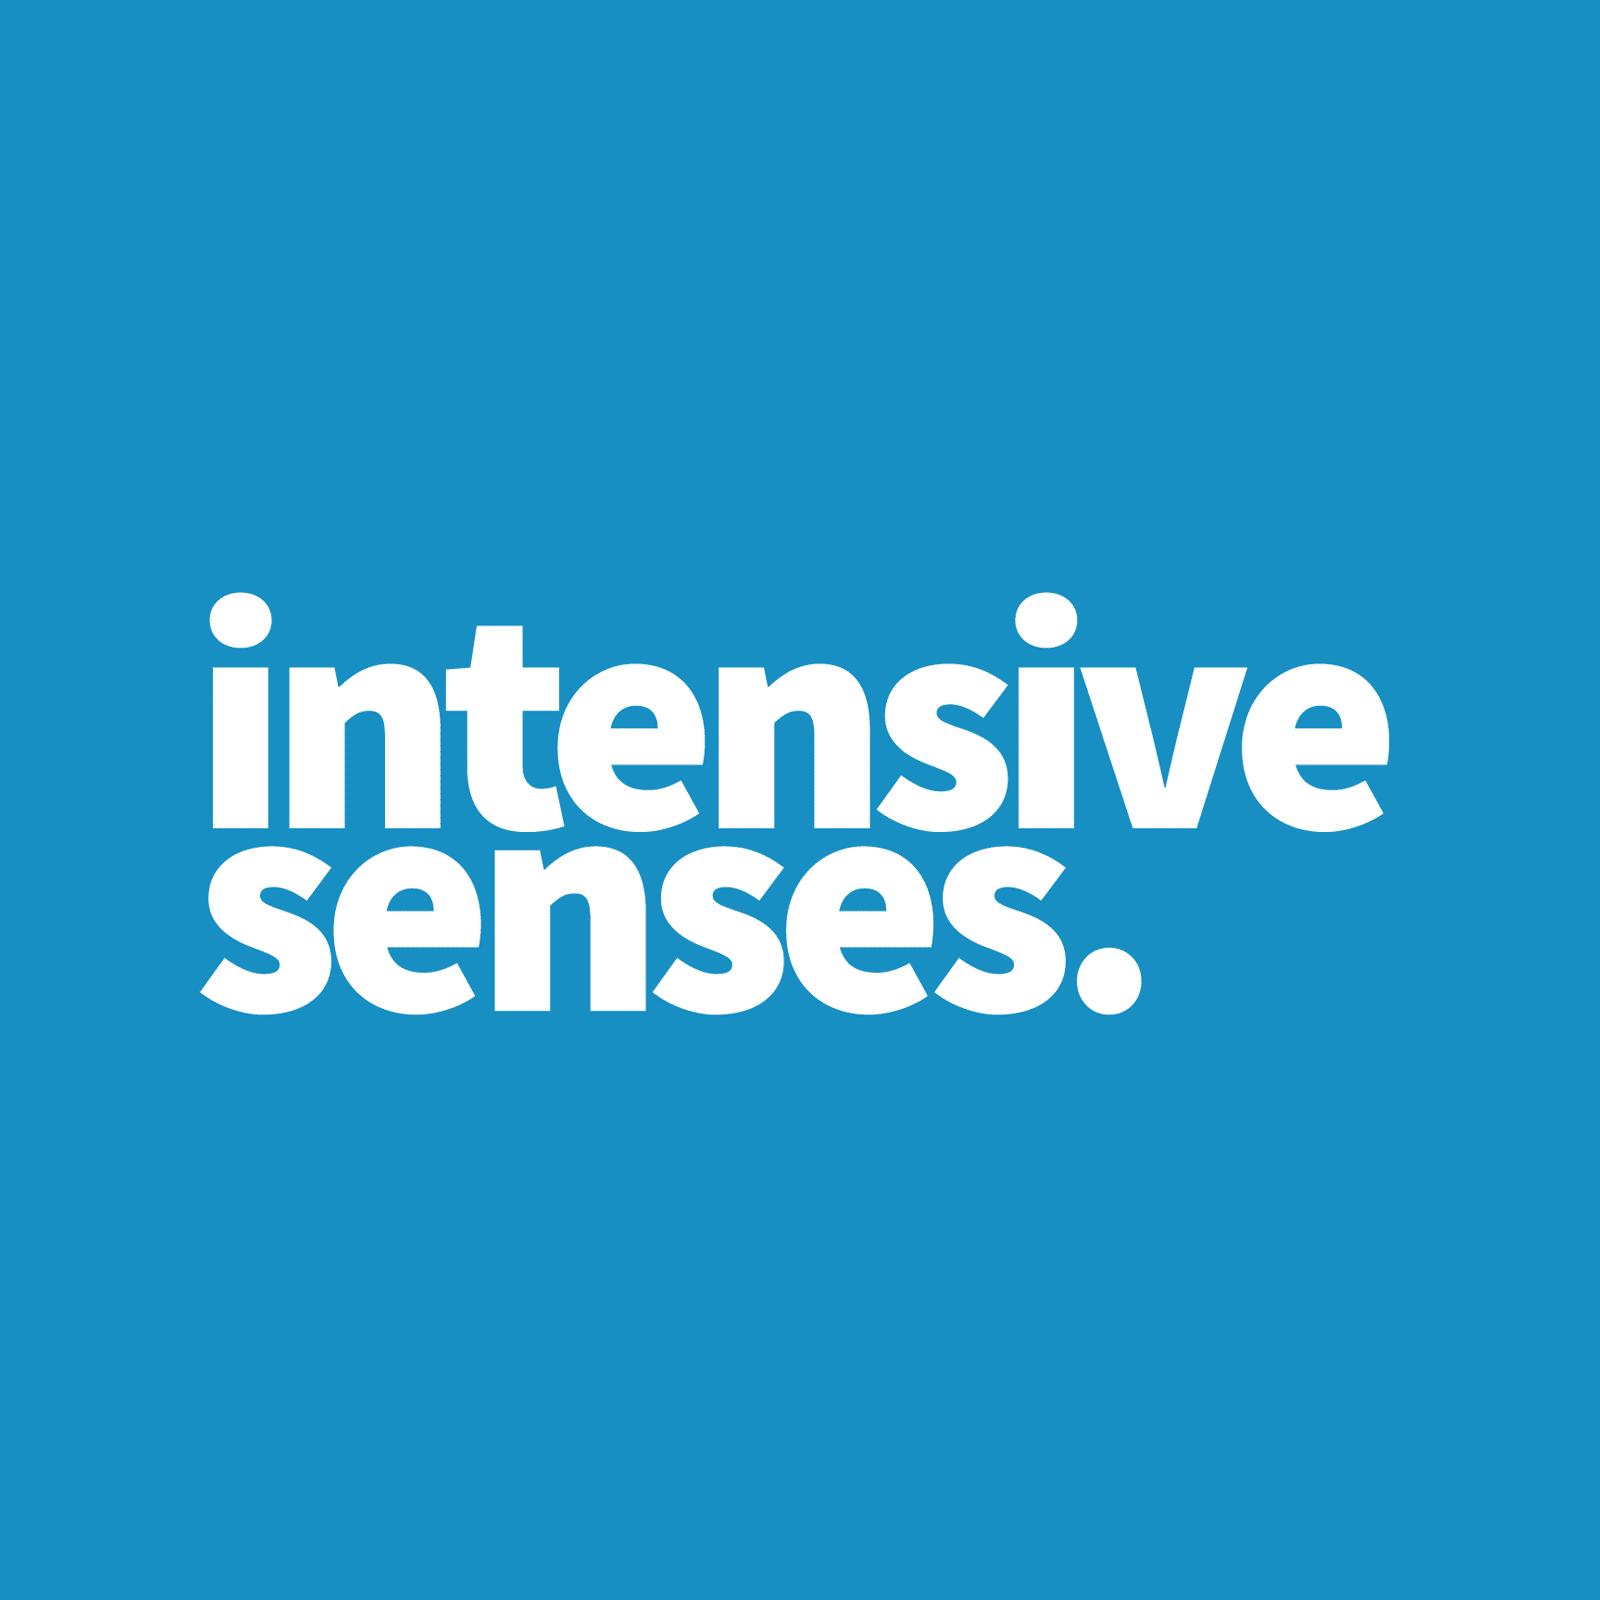 Intensive Senses